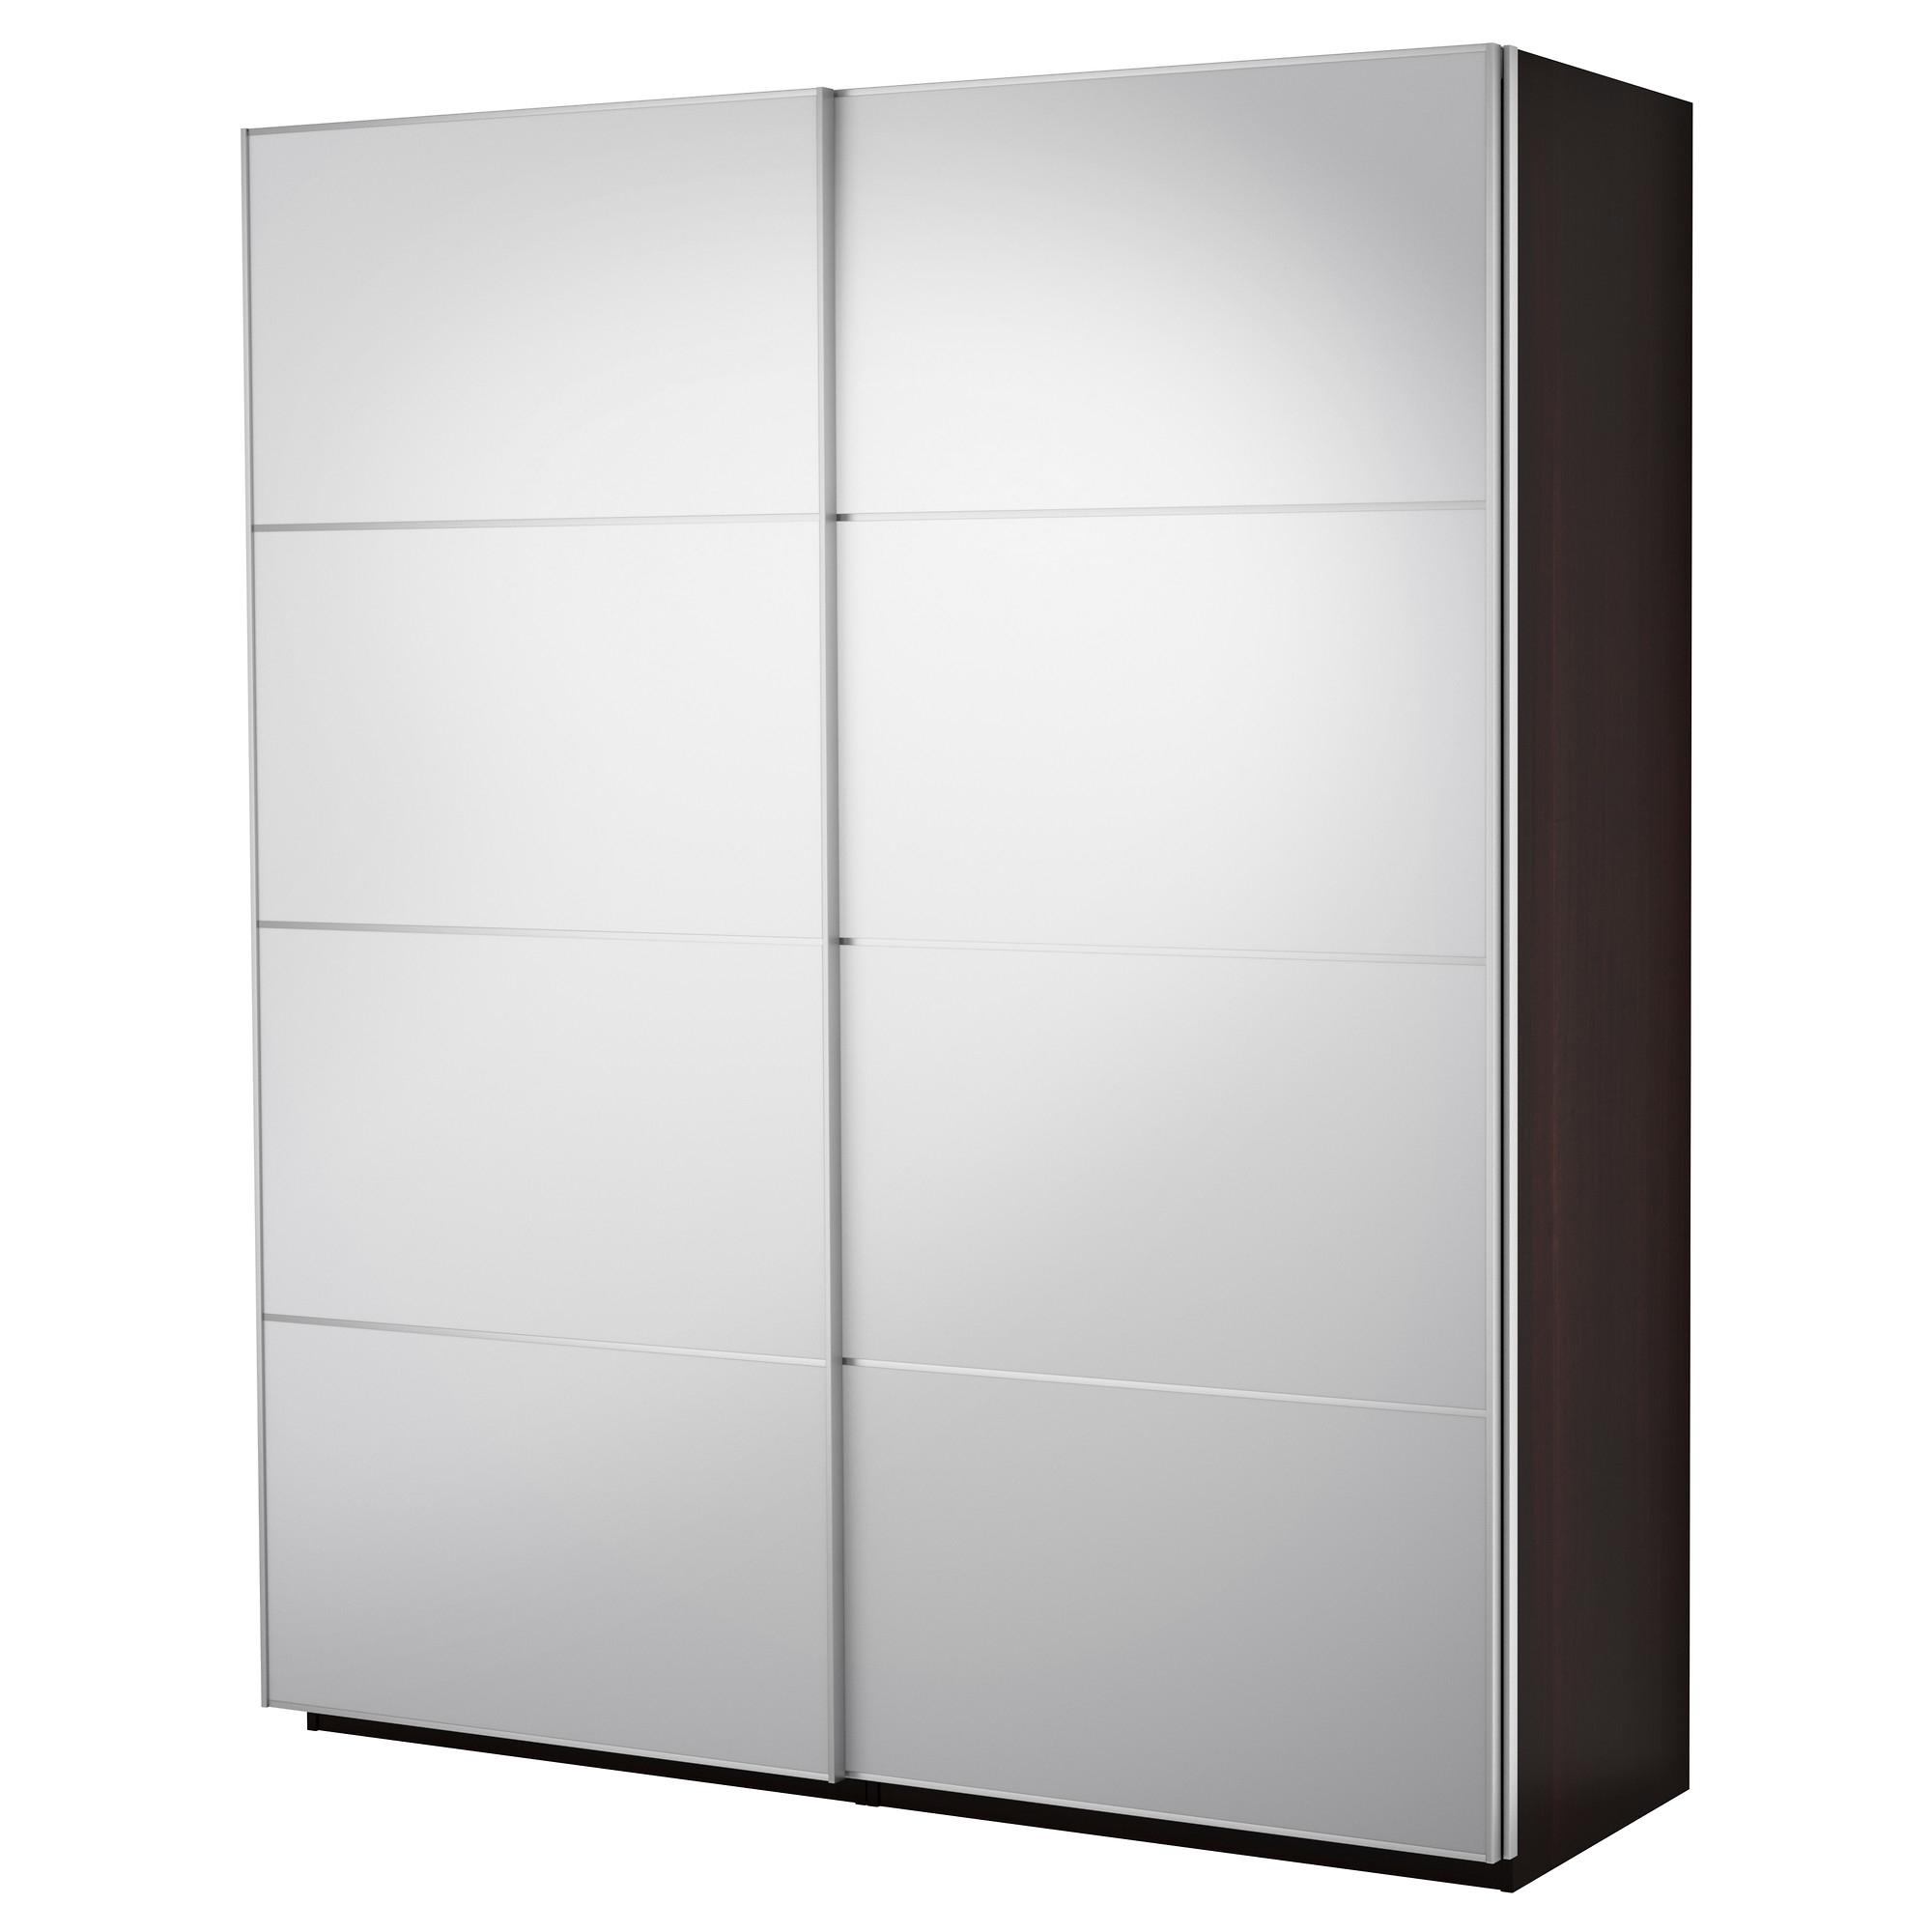 Ikea tenerife detalles producto - Ikea banos armarios ...